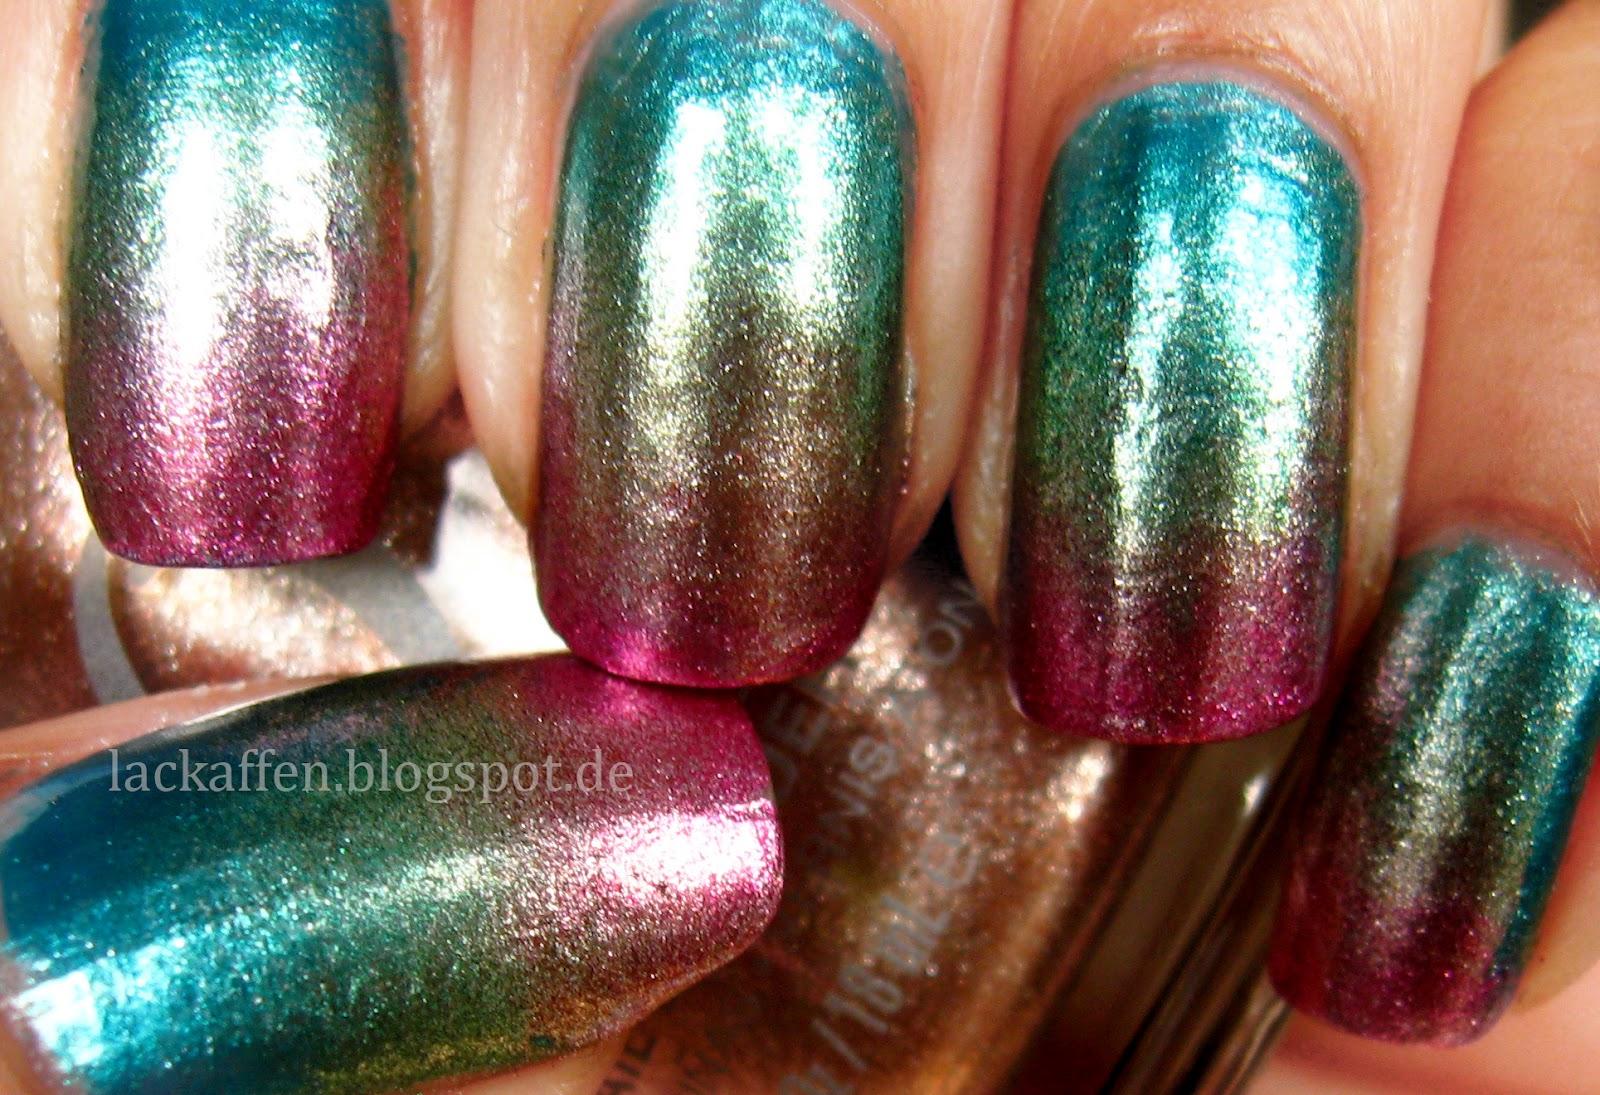 Lackaffen: Metallic Gradient Nails Tutorial